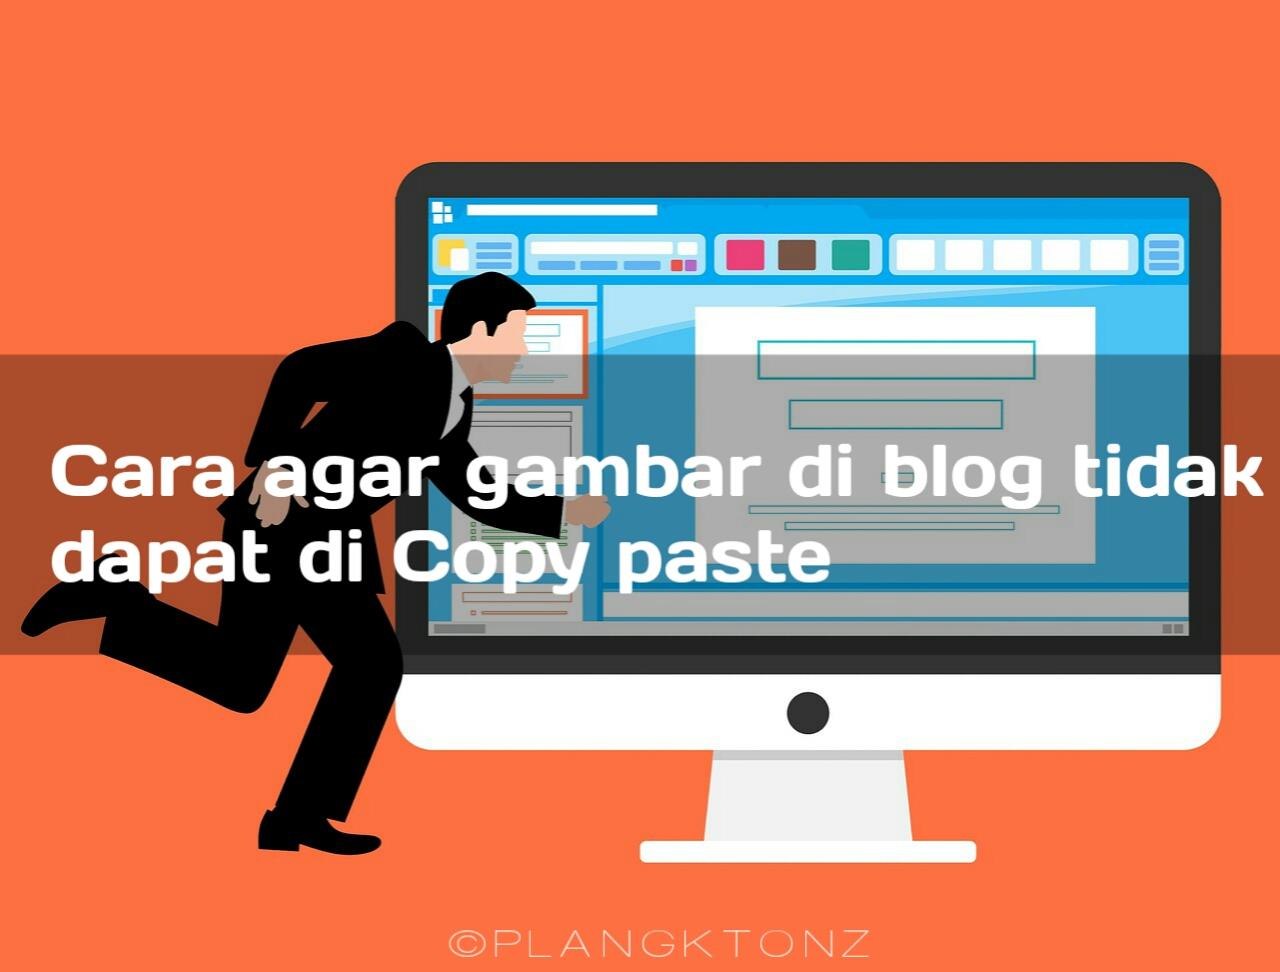 Cara agar gambar di blog tidak dapat di Copy paste